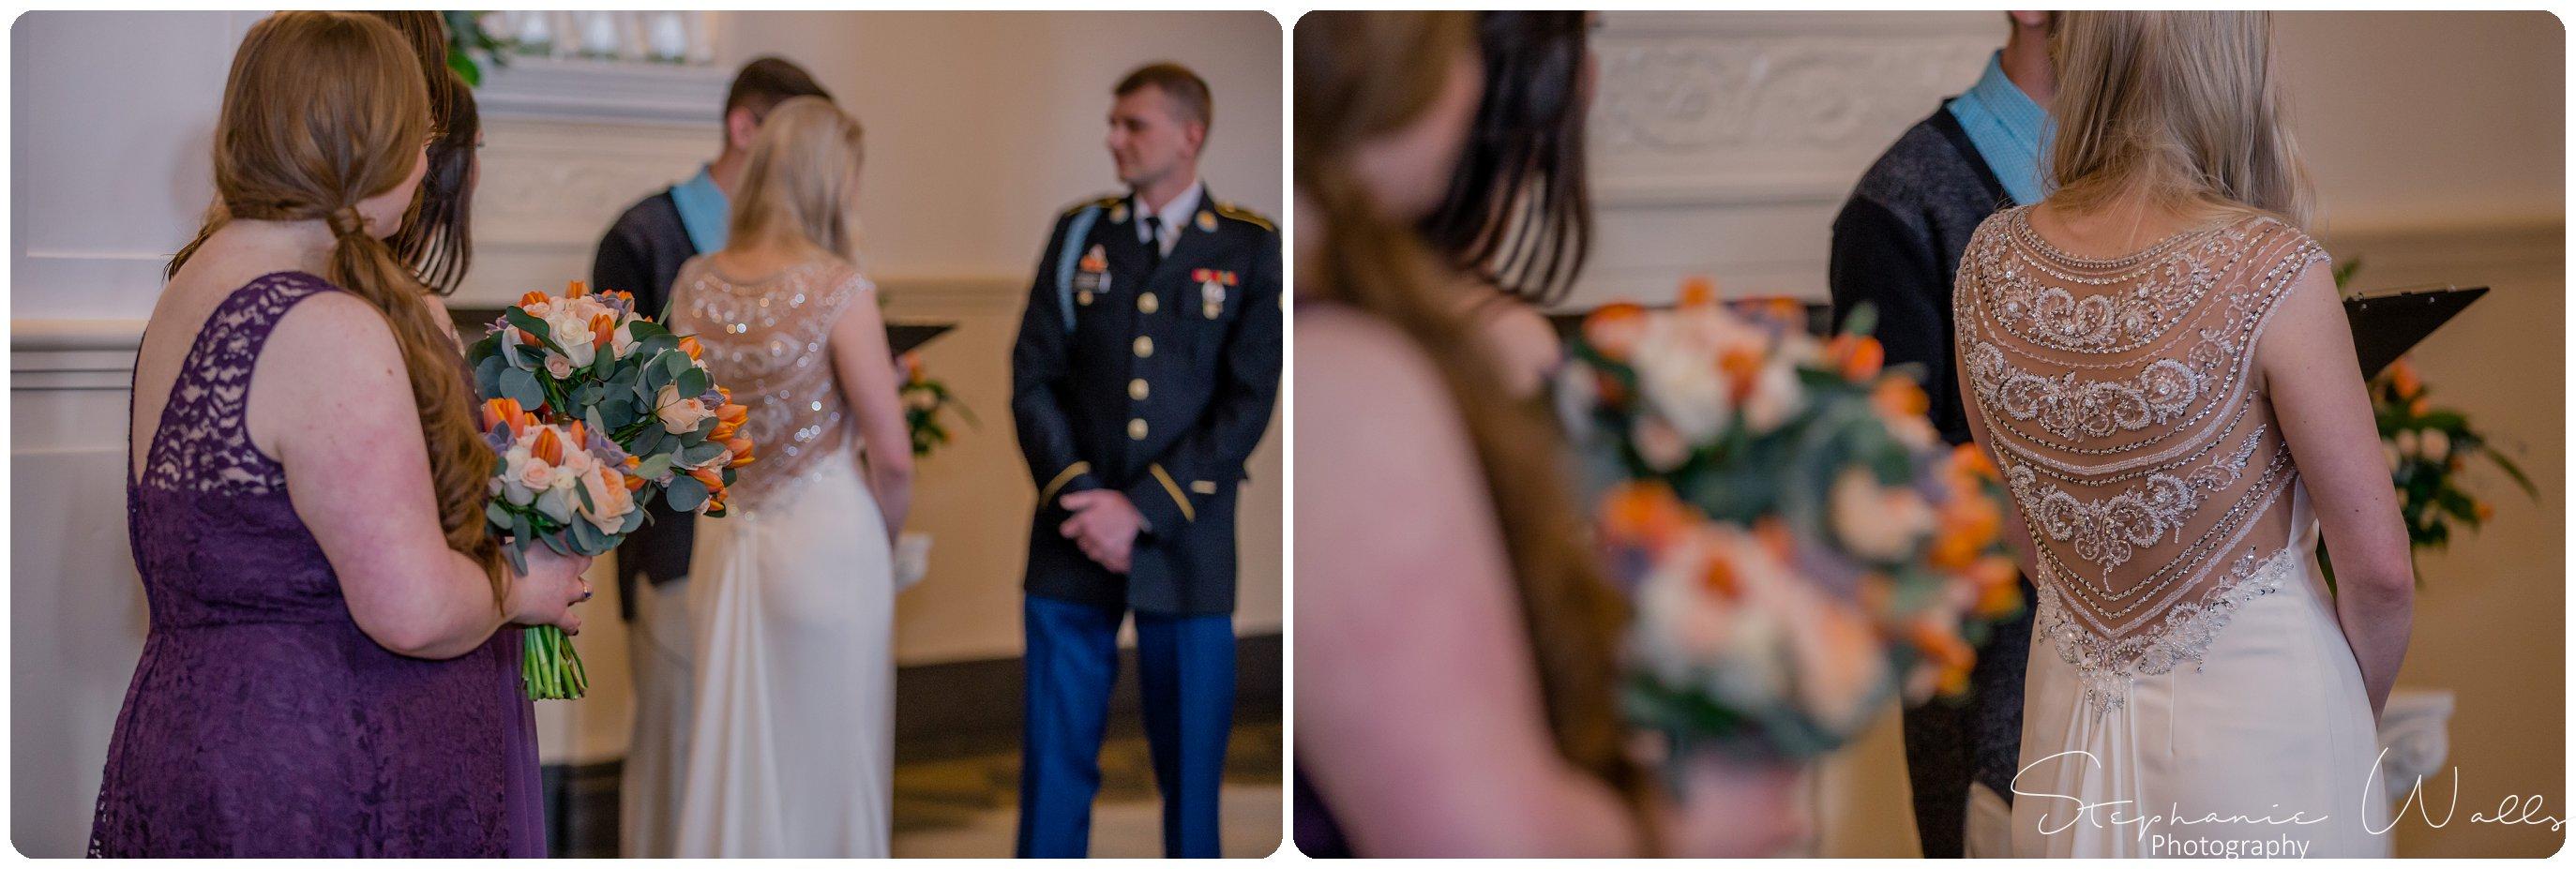 Sears Ceremony 089 The Hero & The Starlet | Monte Cristo Ballroom | Stephanie Walls Photography Weddings